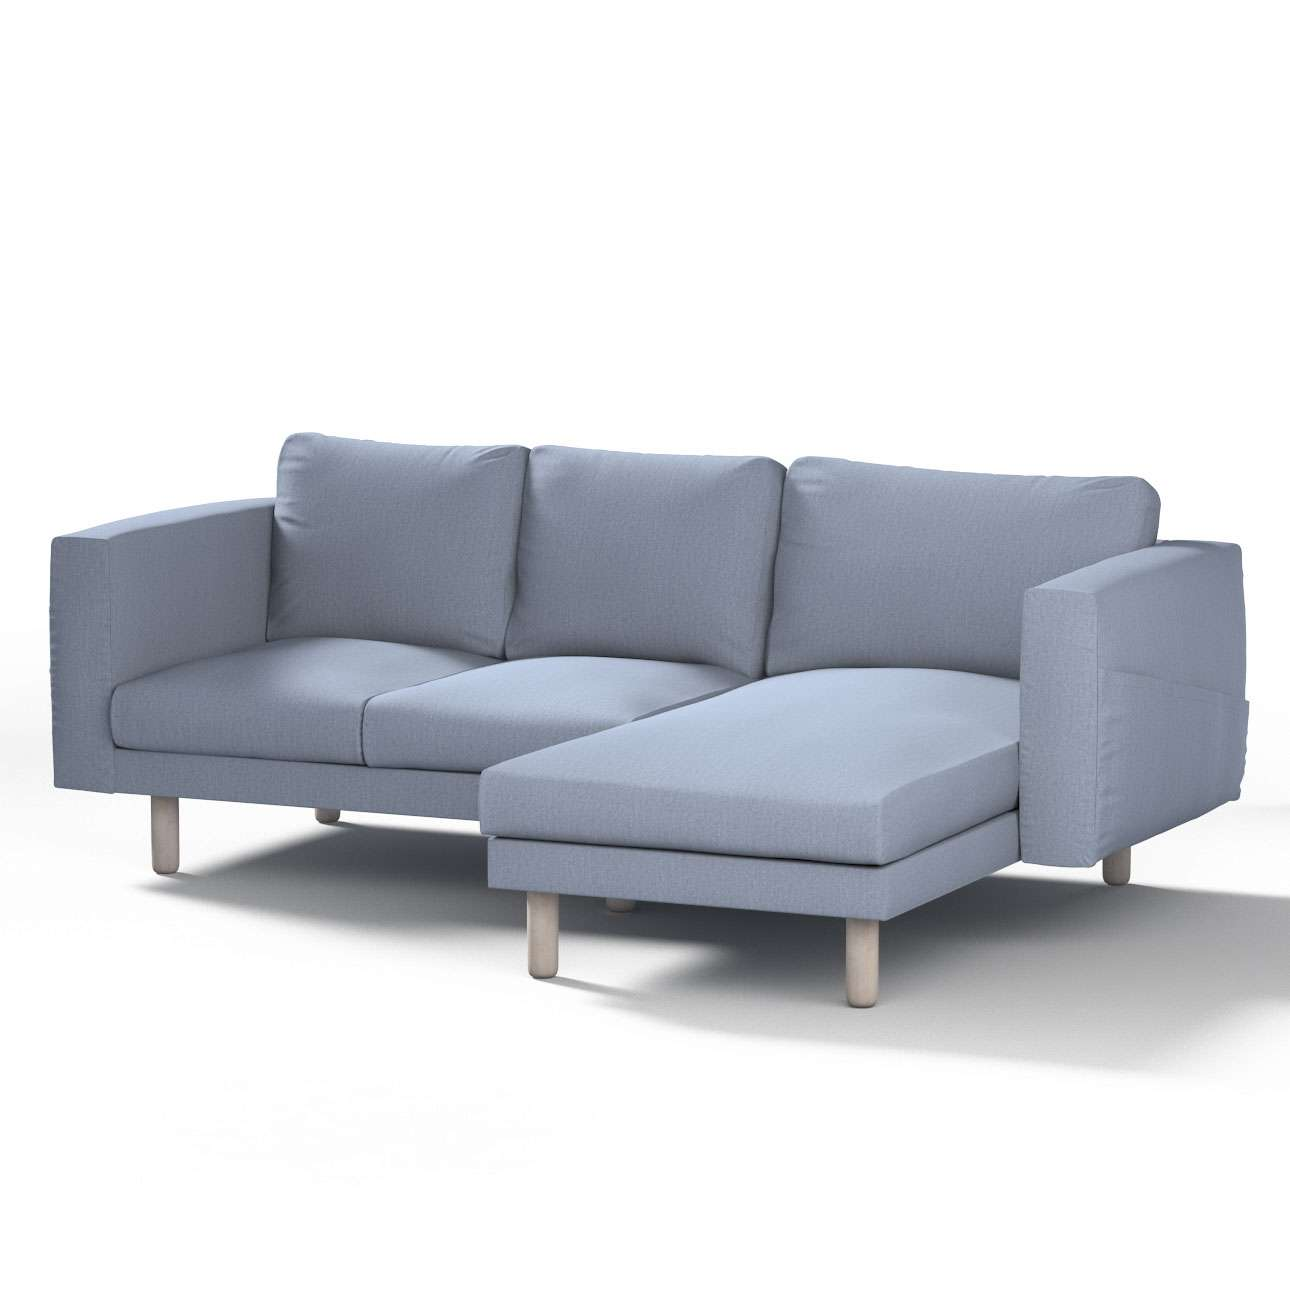 norsborg bezug f r 3 sitzer sofa mit recamiere silber. Black Bedroom Furniture Sets. Home Design Ideas